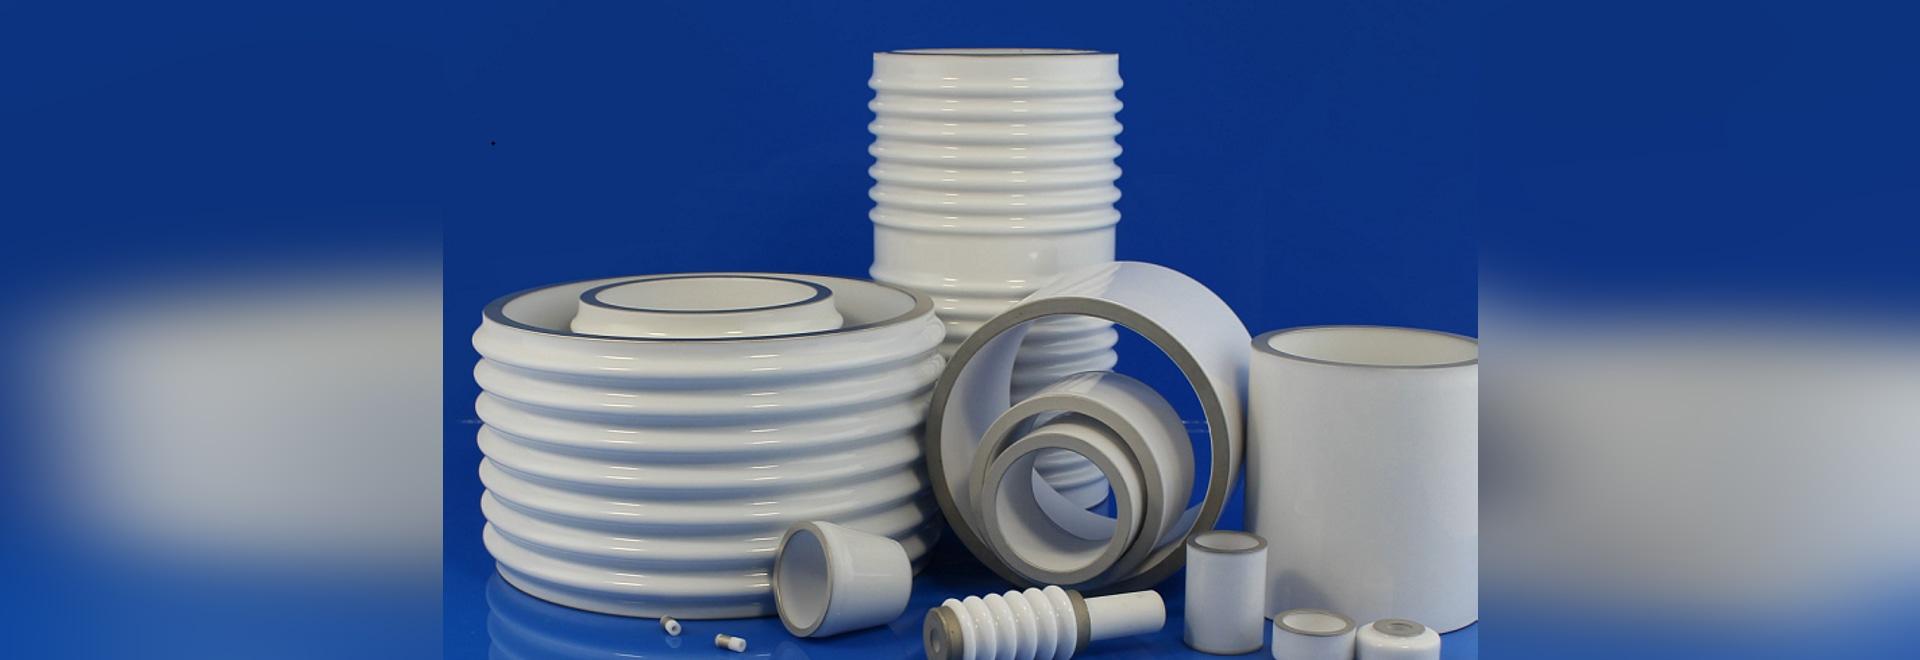 Technical Ceramics Provide Solution For eMobility developments